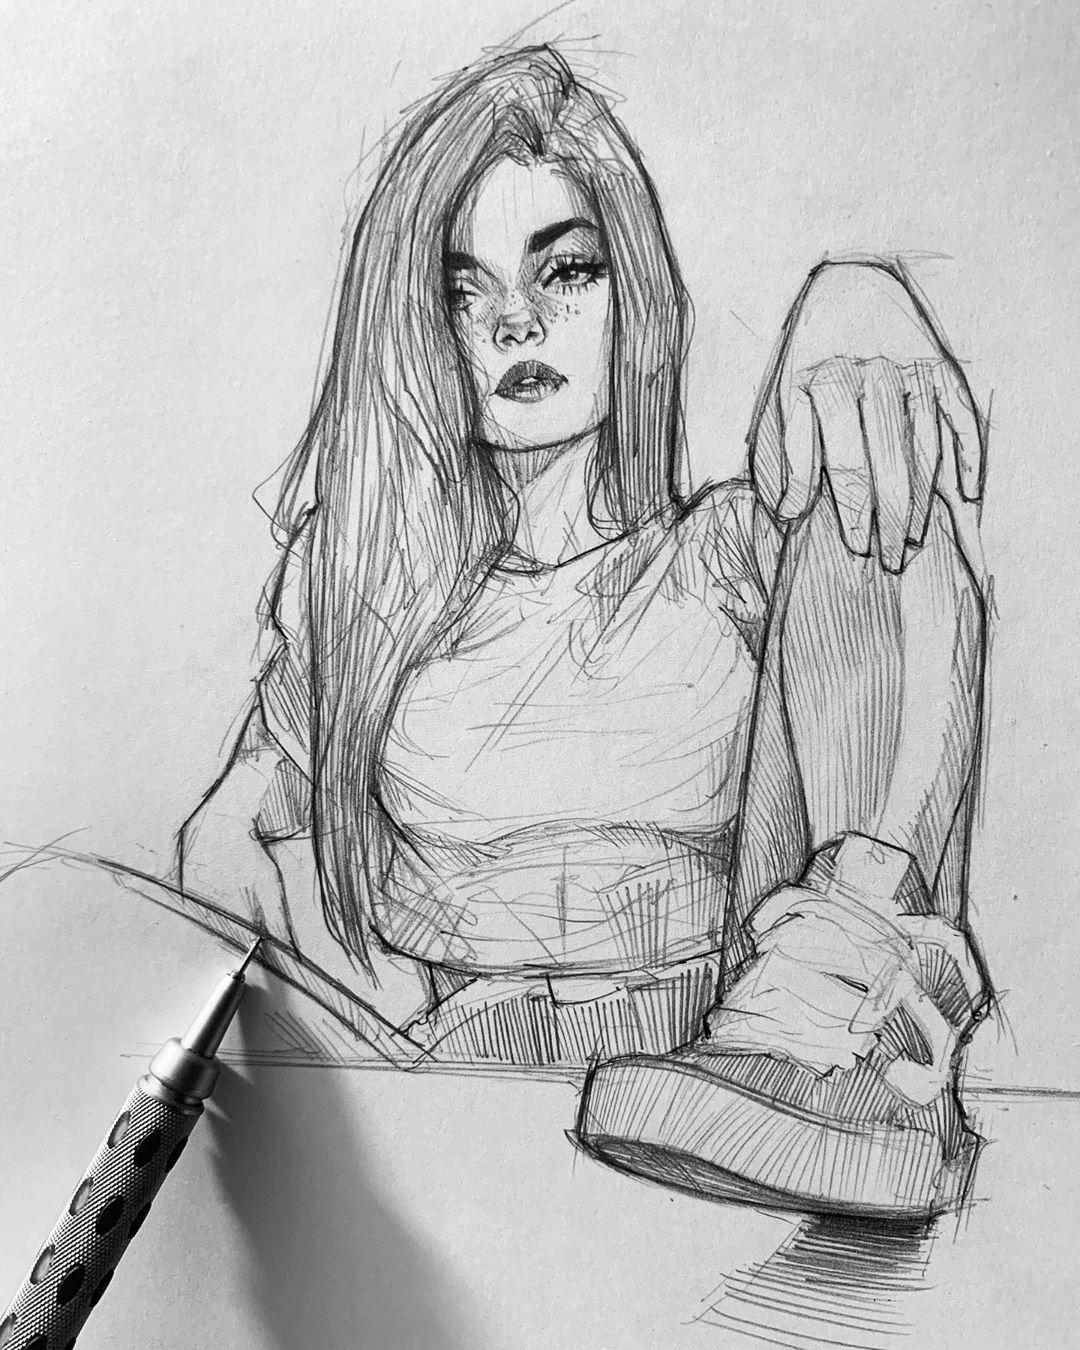 Coup De Coeur The Good Sketches Of Ephraim Unhealthy Artwork Sketchbook Co In 2020 Pencil Portrait Portrait Art Cool Art Drawings